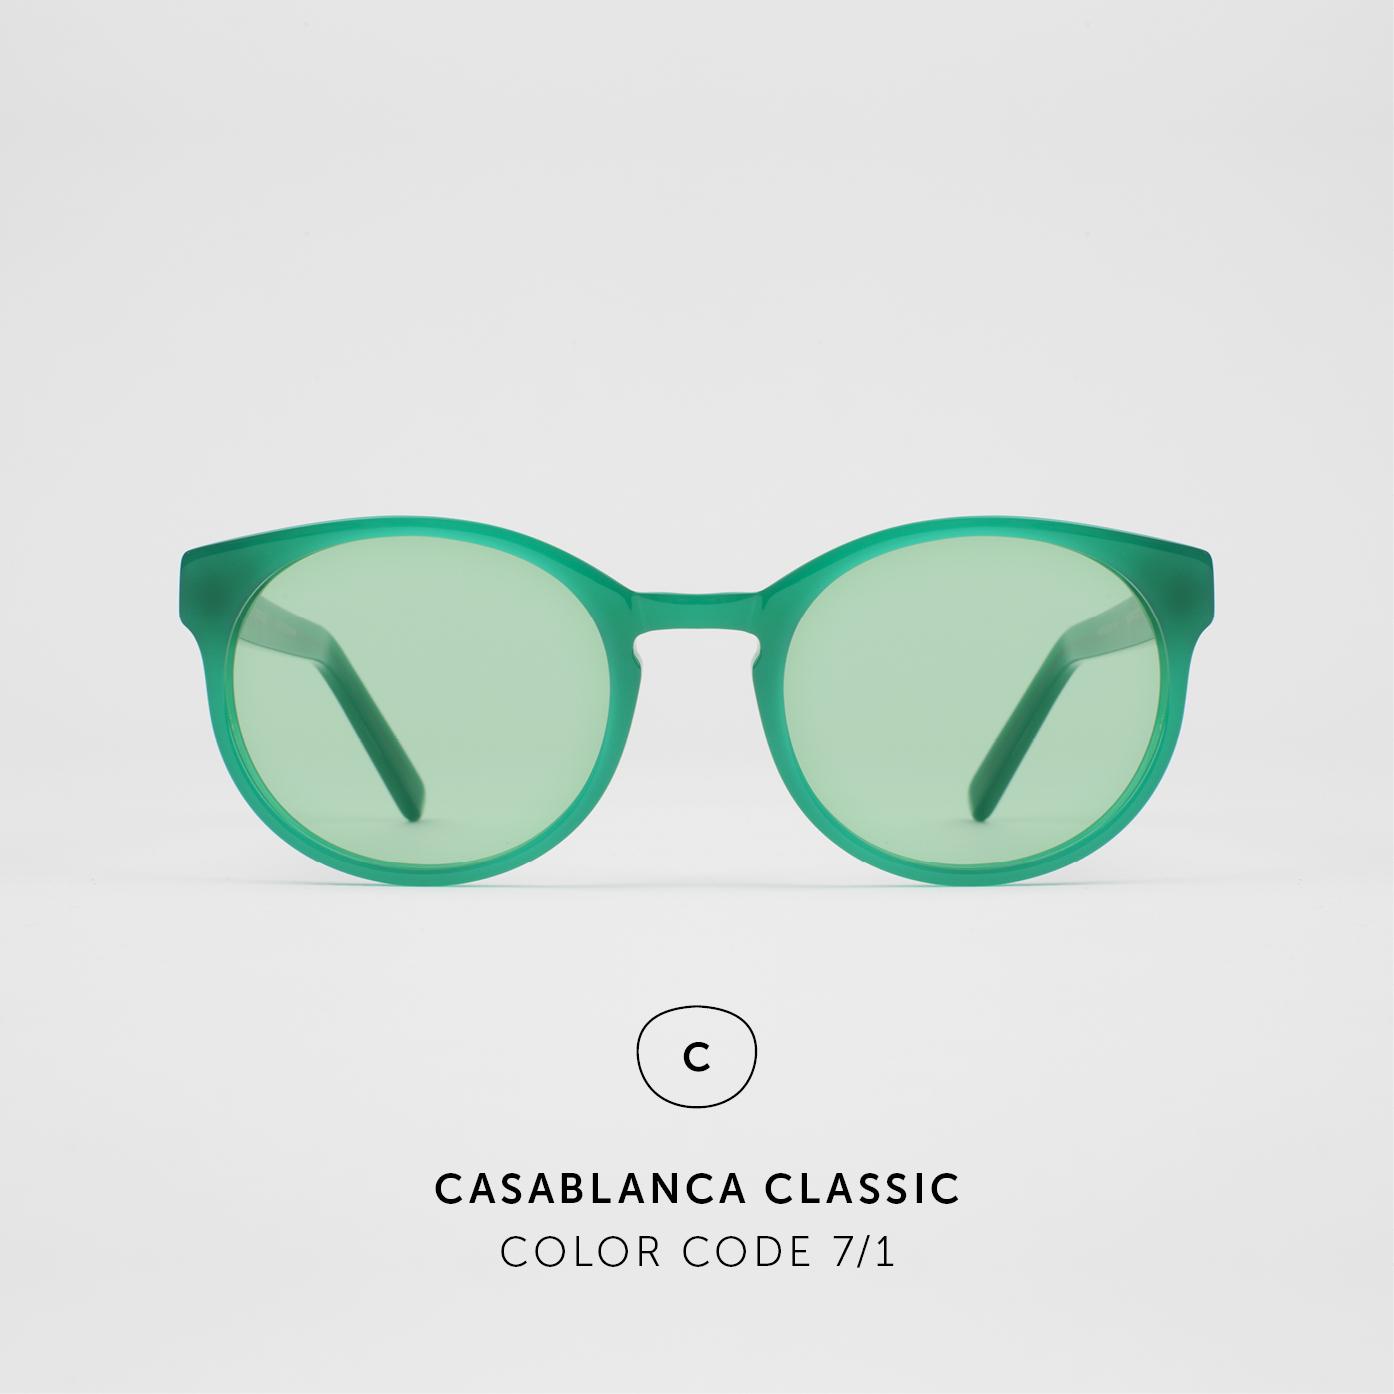 CasablancaClassic31.jpg